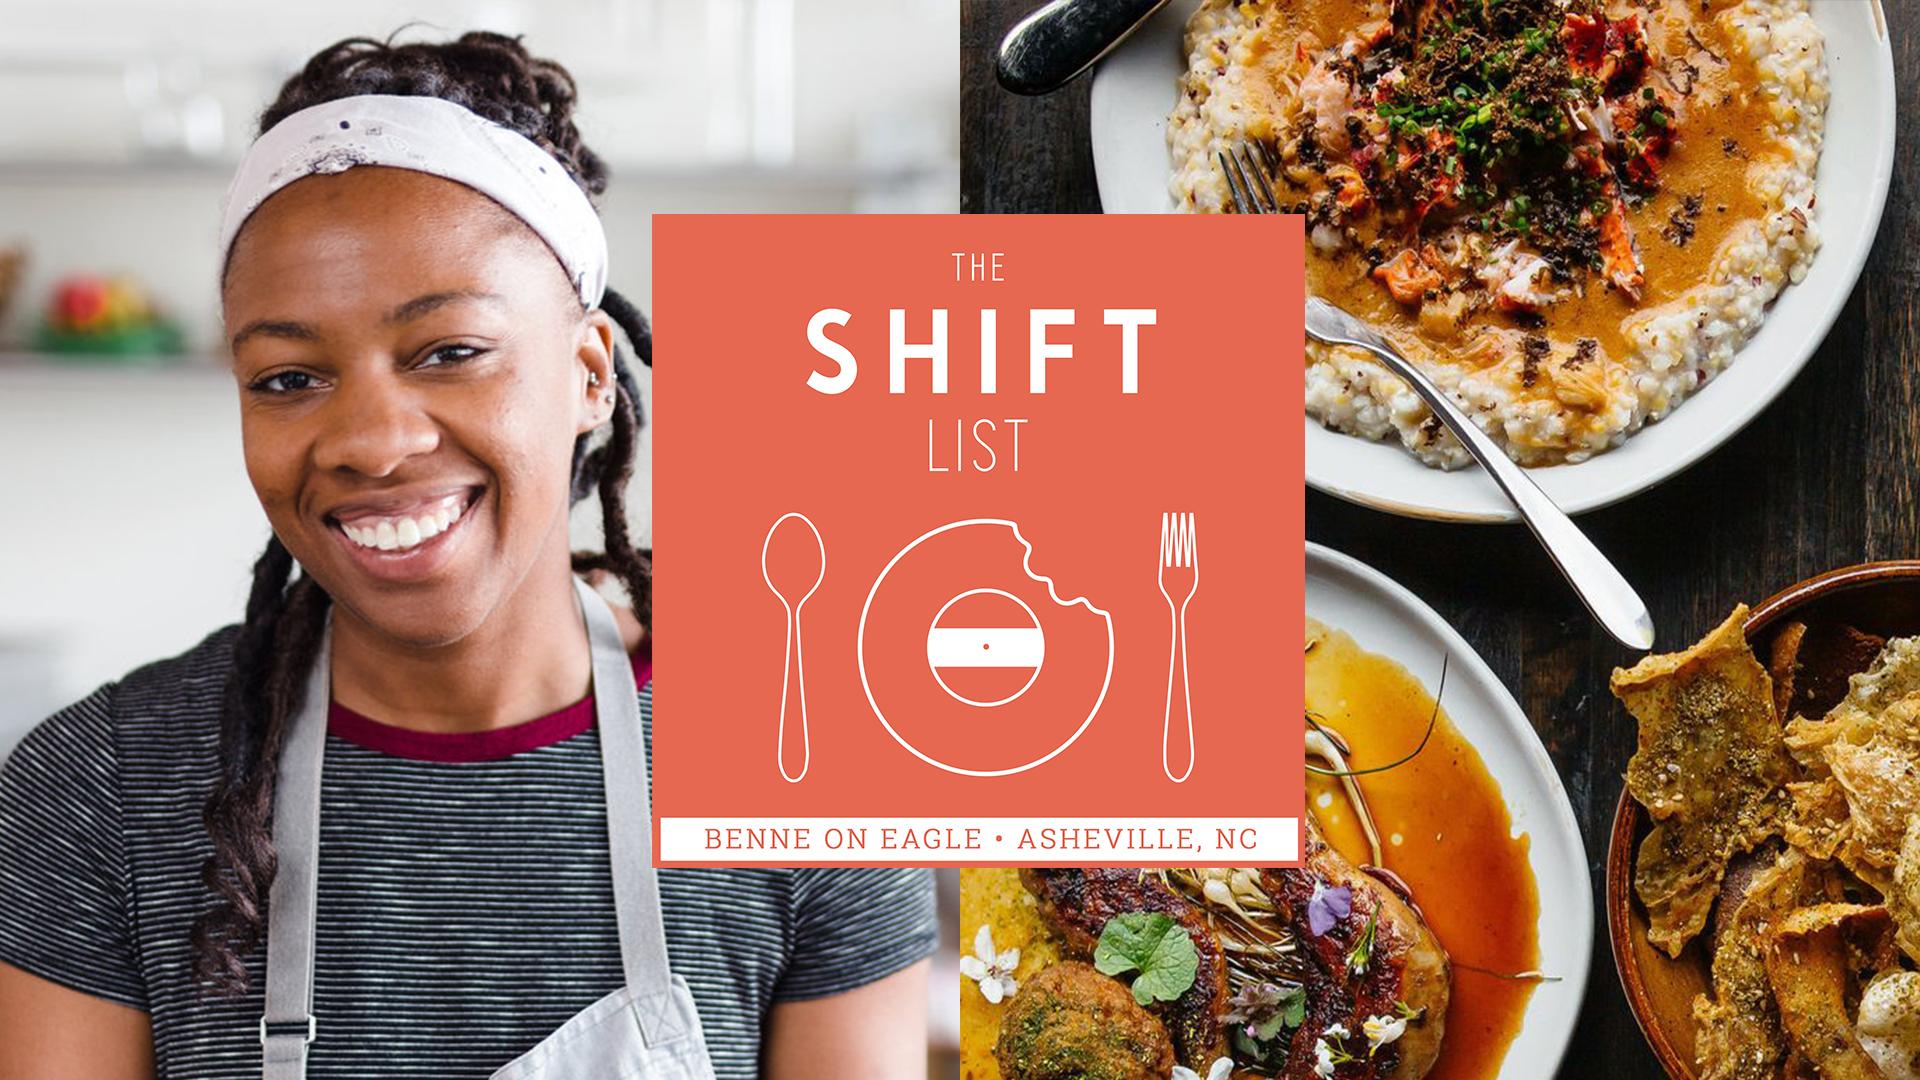 The Shift List - Ashleigh Shanti (Benne on Eagle) - Asheville, N.C.